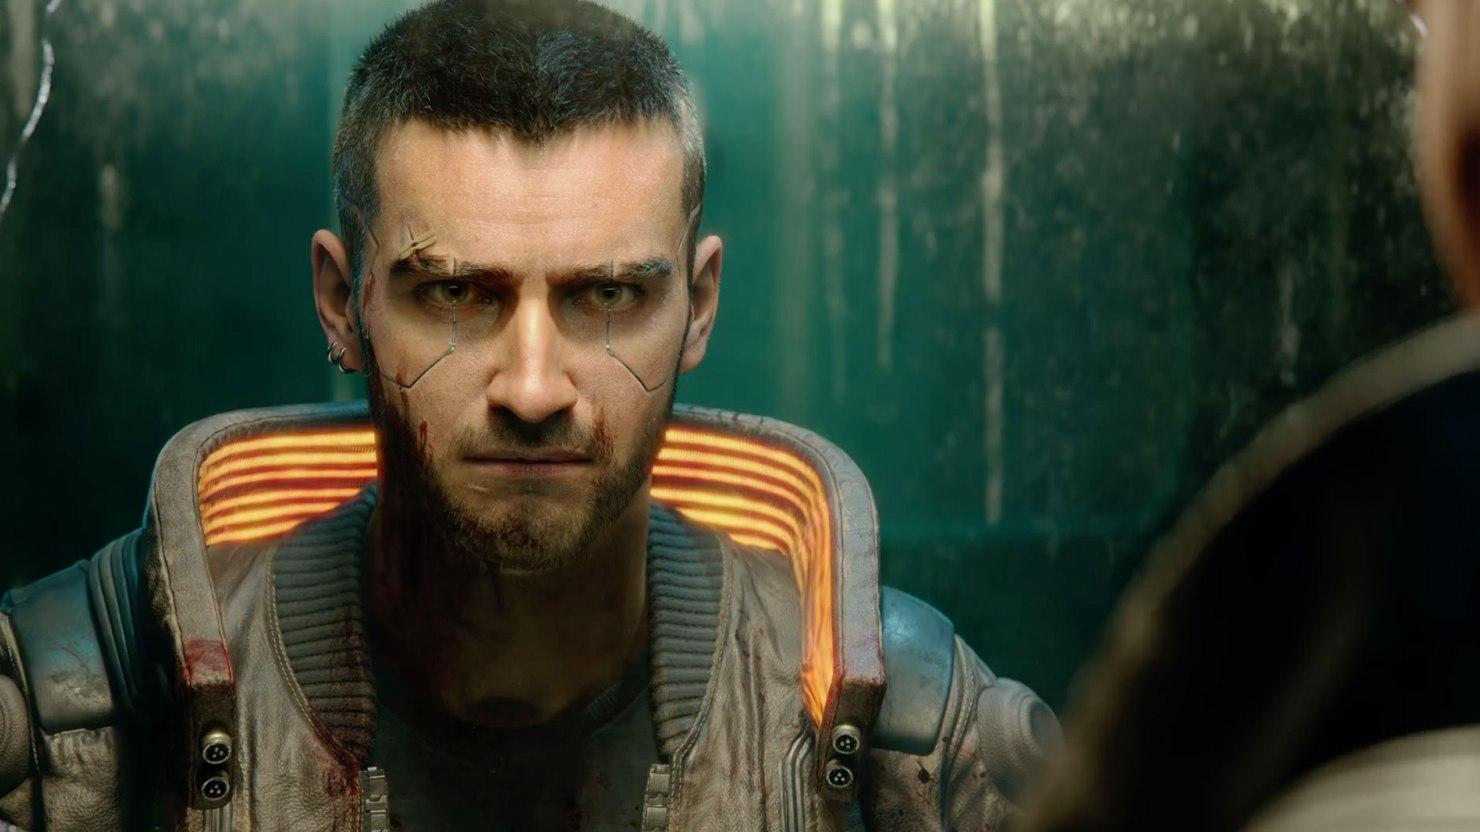 Скандал набирает обороты - Sony удалила Cyberpunk 2077 из PSN 3